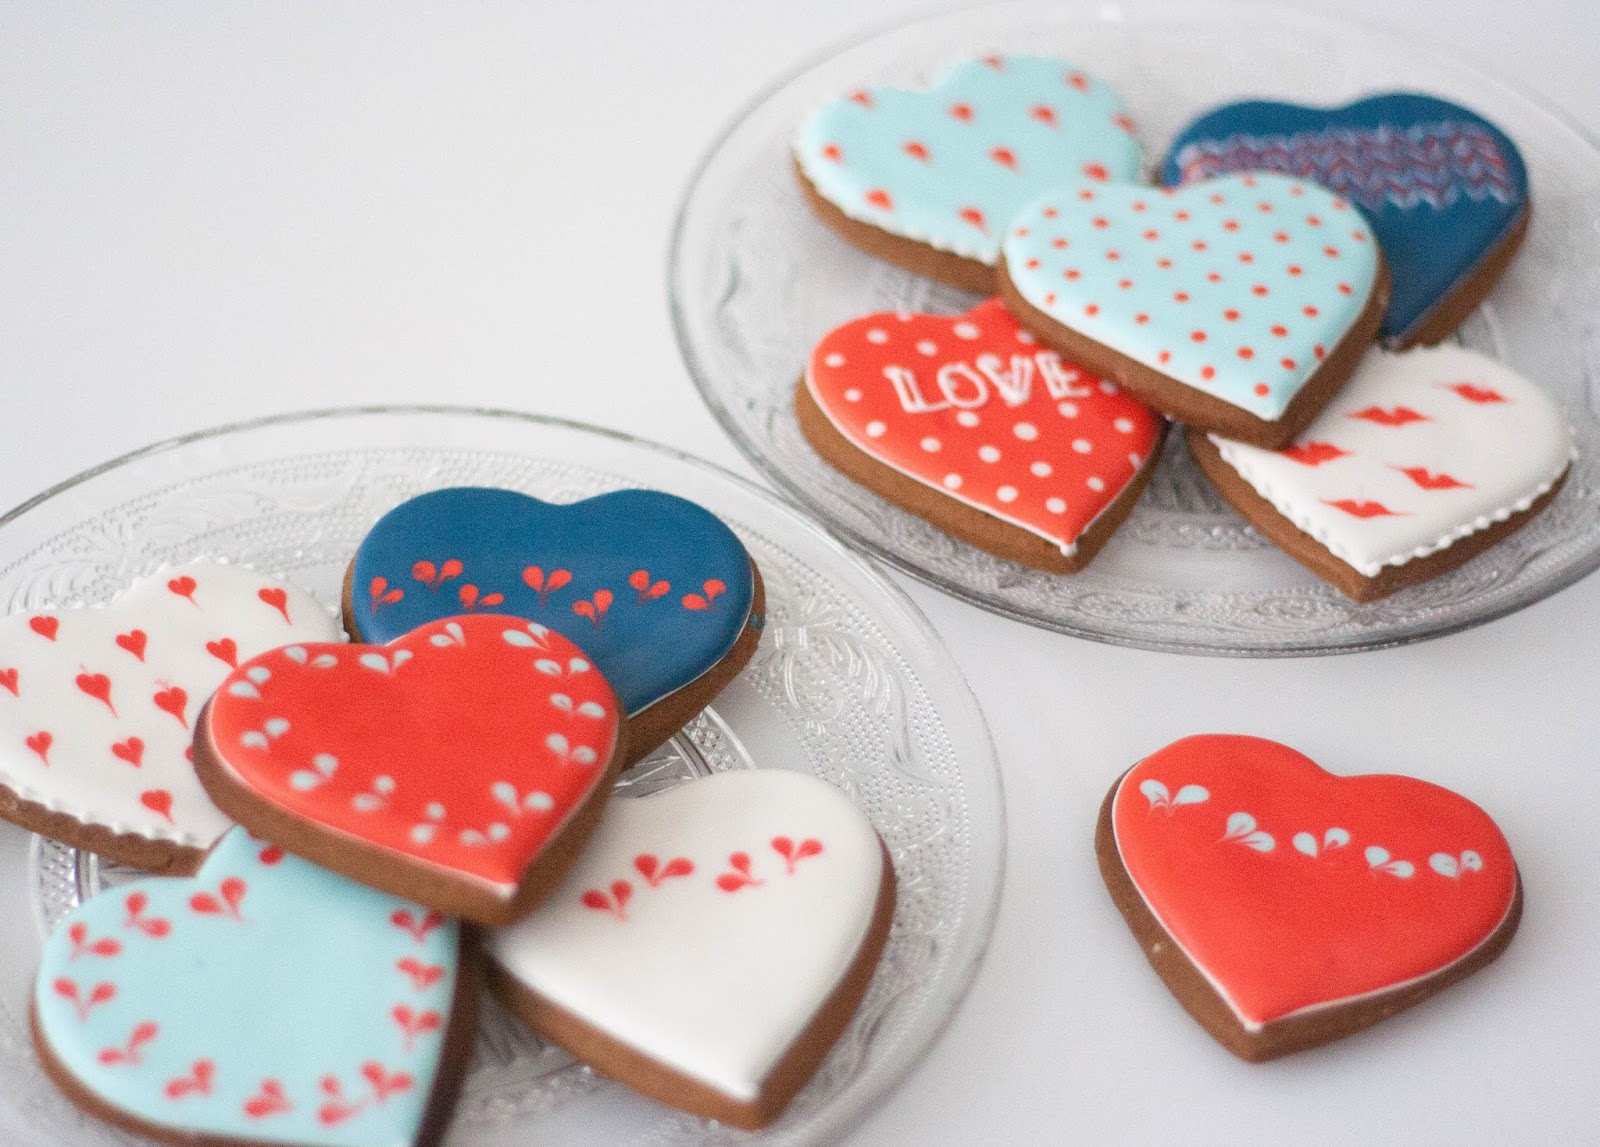 Spoonful of Sugar: Aqua faba royal icing on cookies